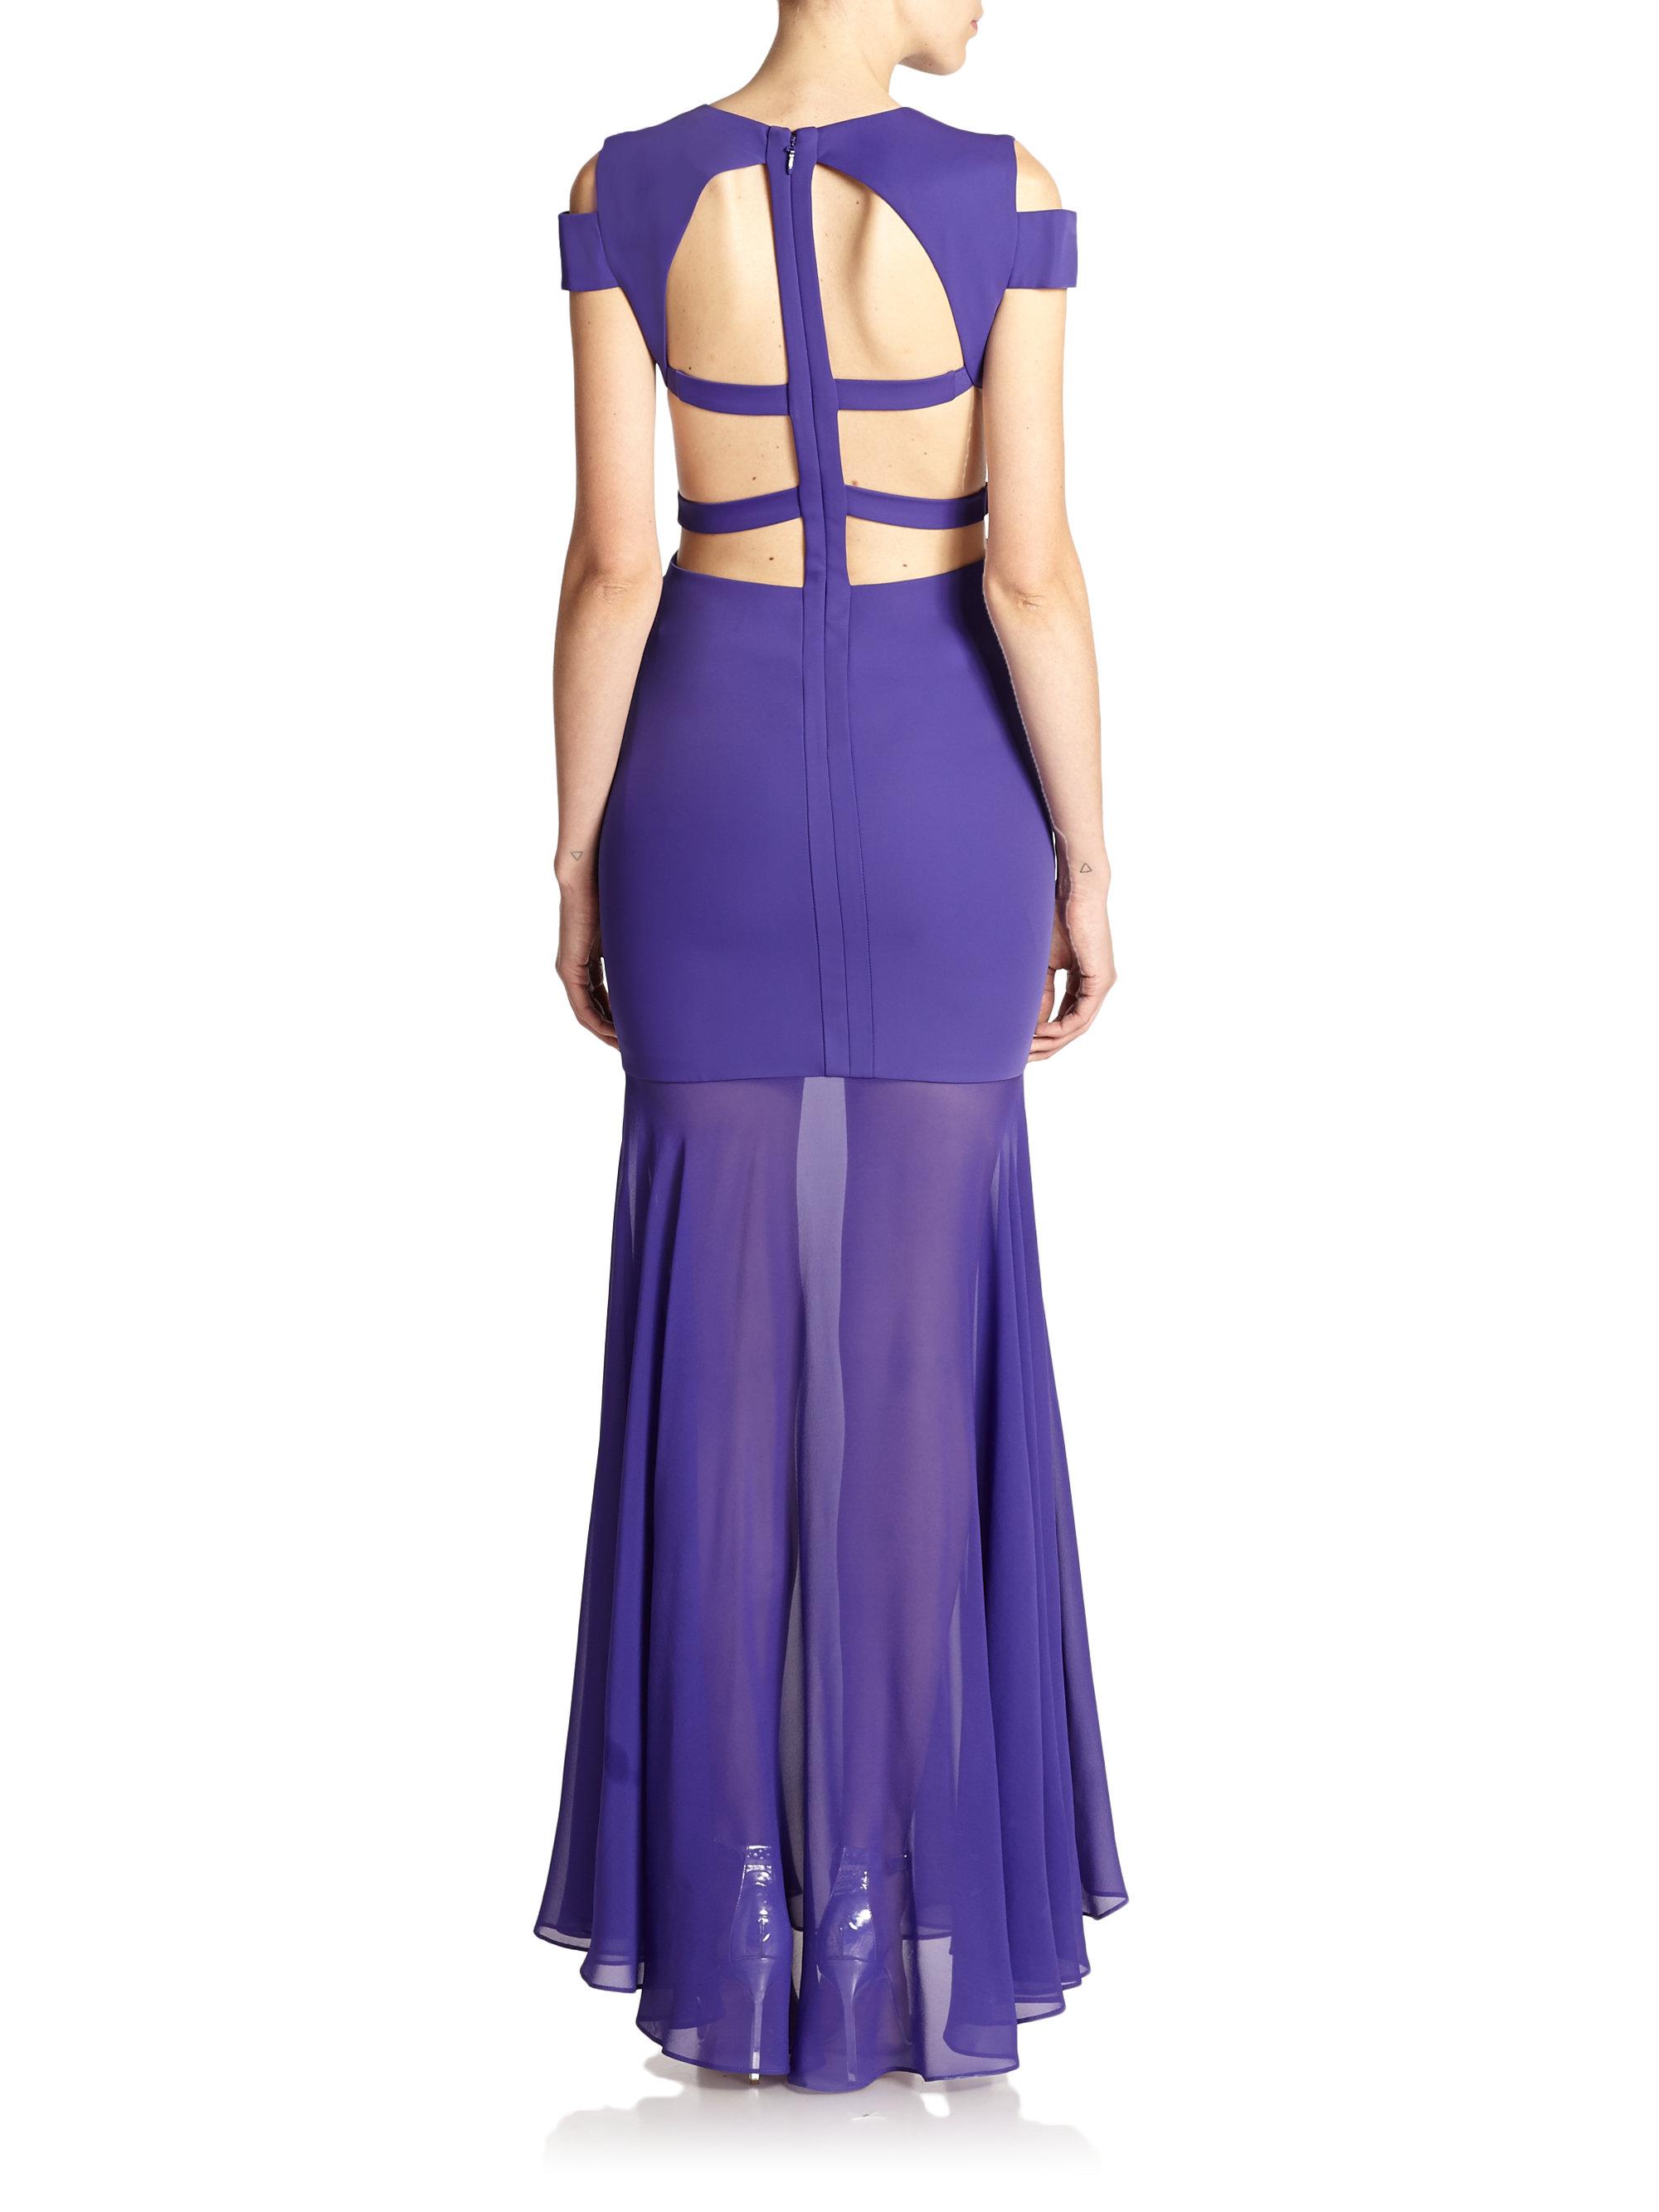 Lyst - Bcbgmaxazria Ava Cutout Gown in Blue